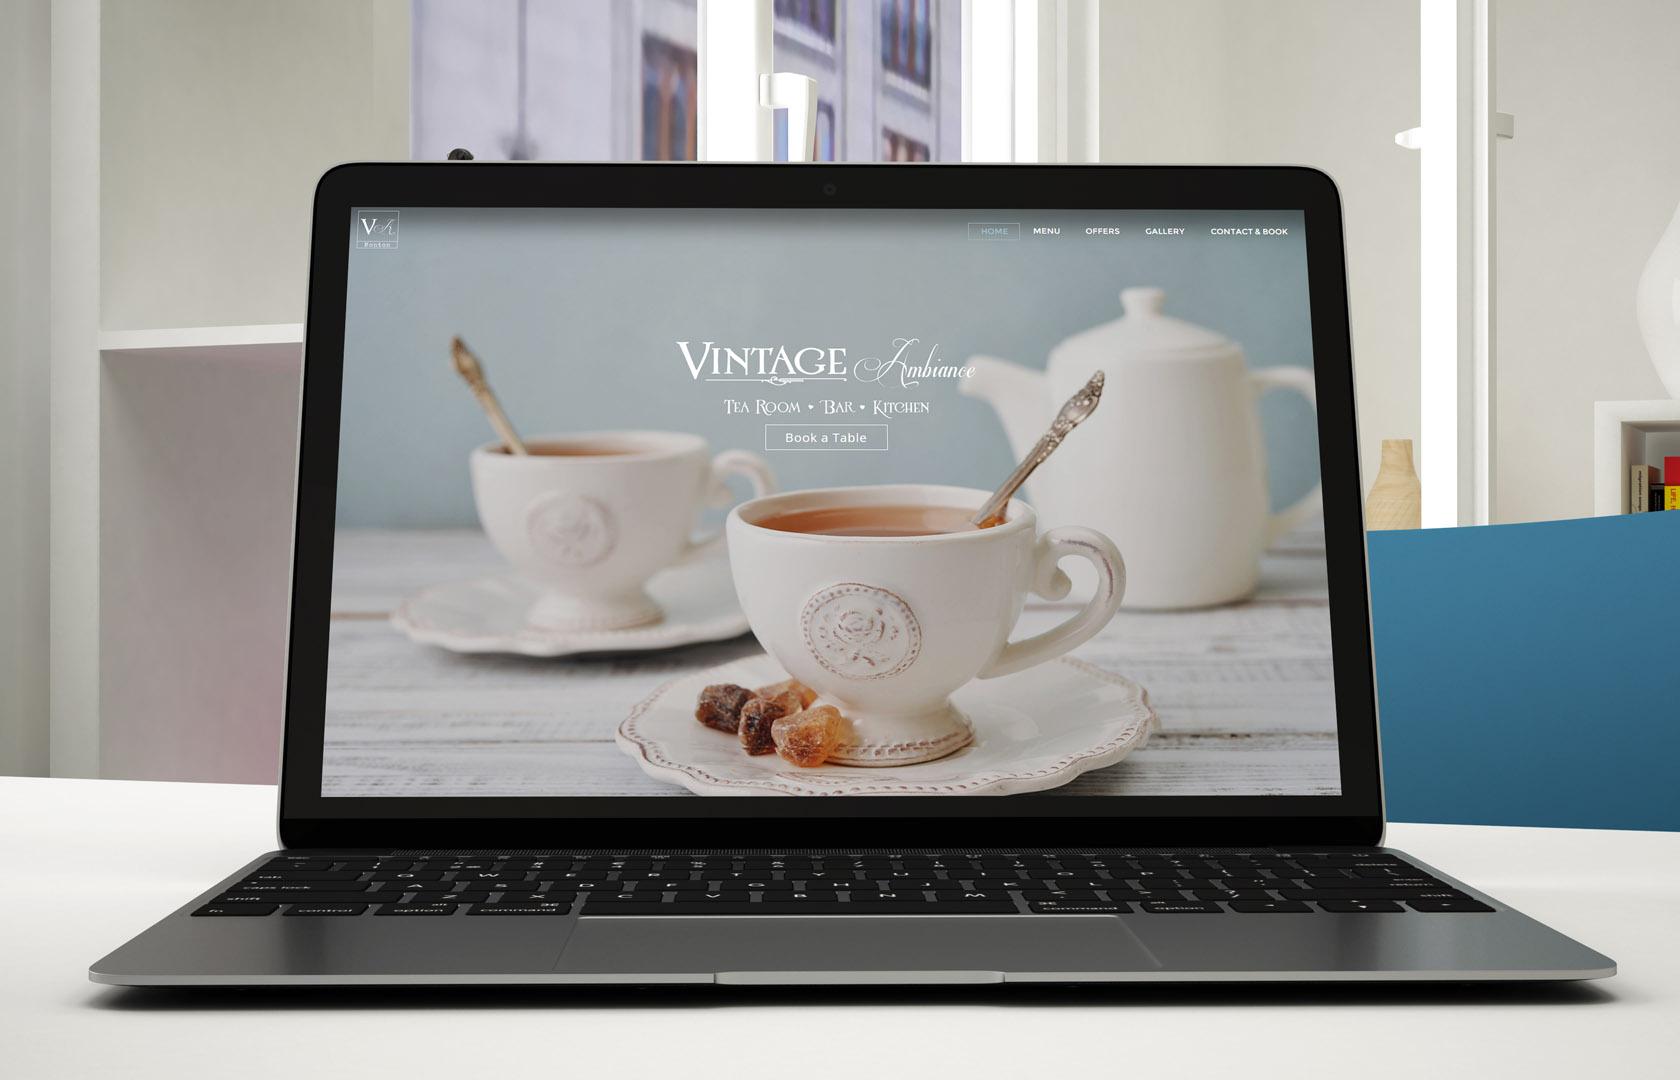 Vintageambiance website